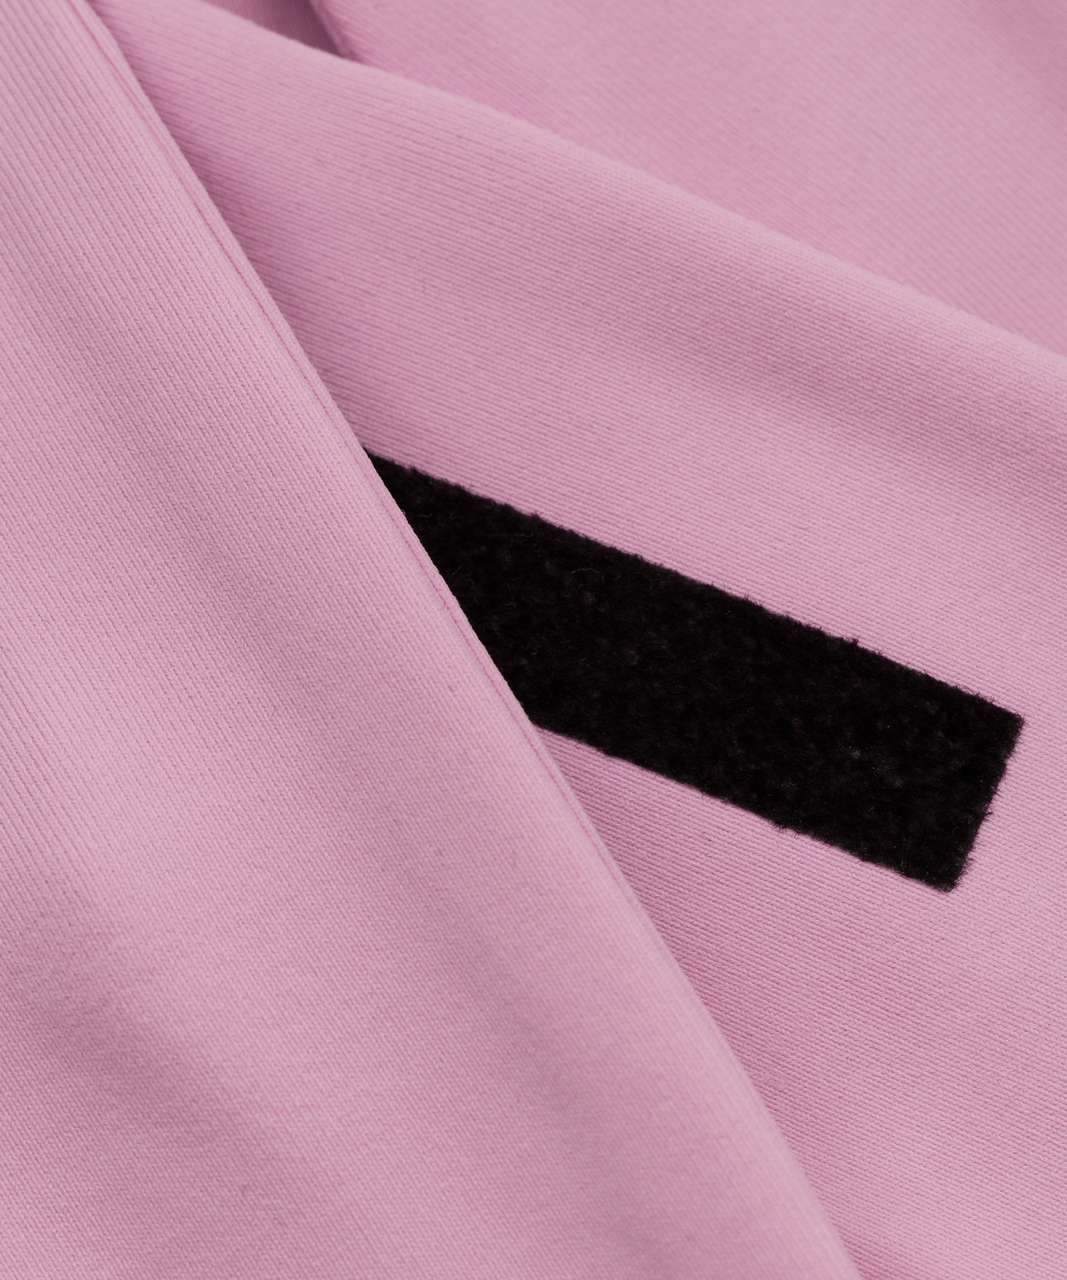 Lululemon Fly Away Tamer Headband II (Luxtreme) - Cherry Blossom Pink